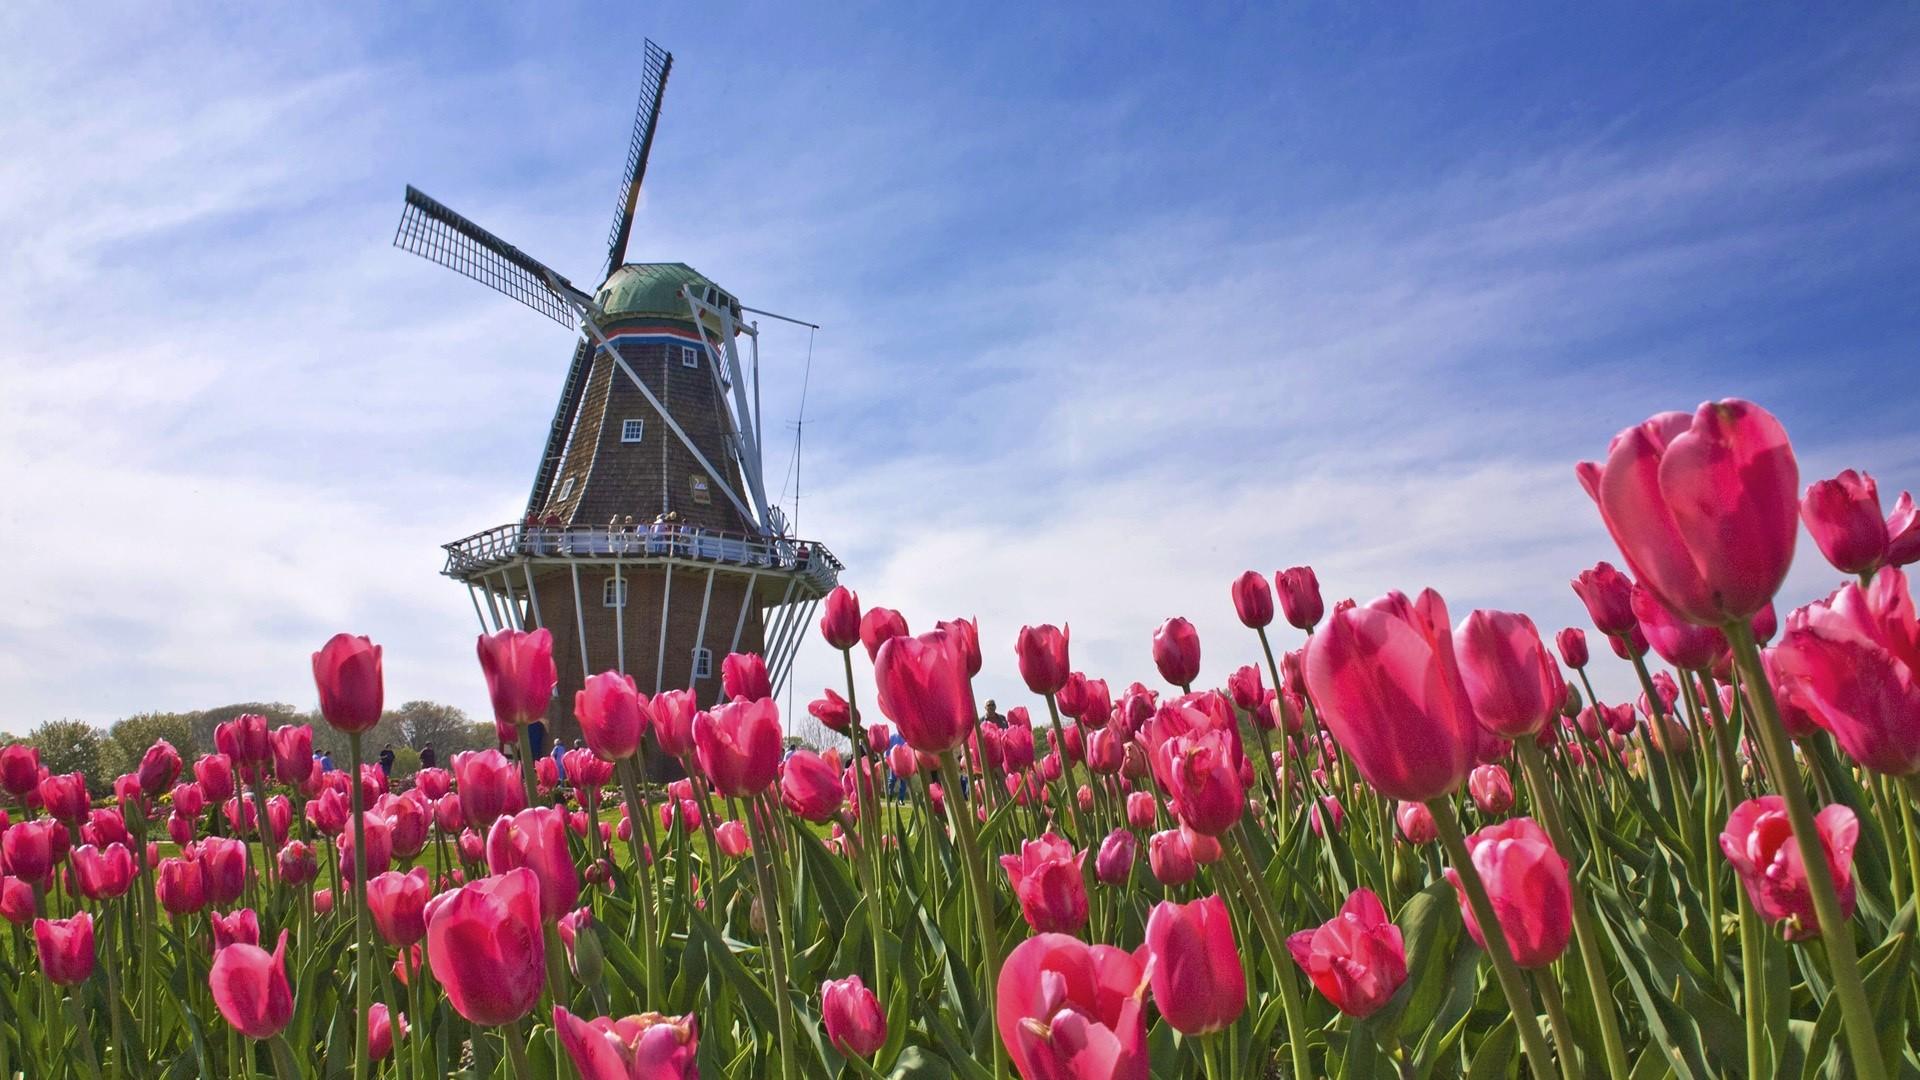 Tulip Festival At Windmill Island Park Holland Michigan Hqworld.